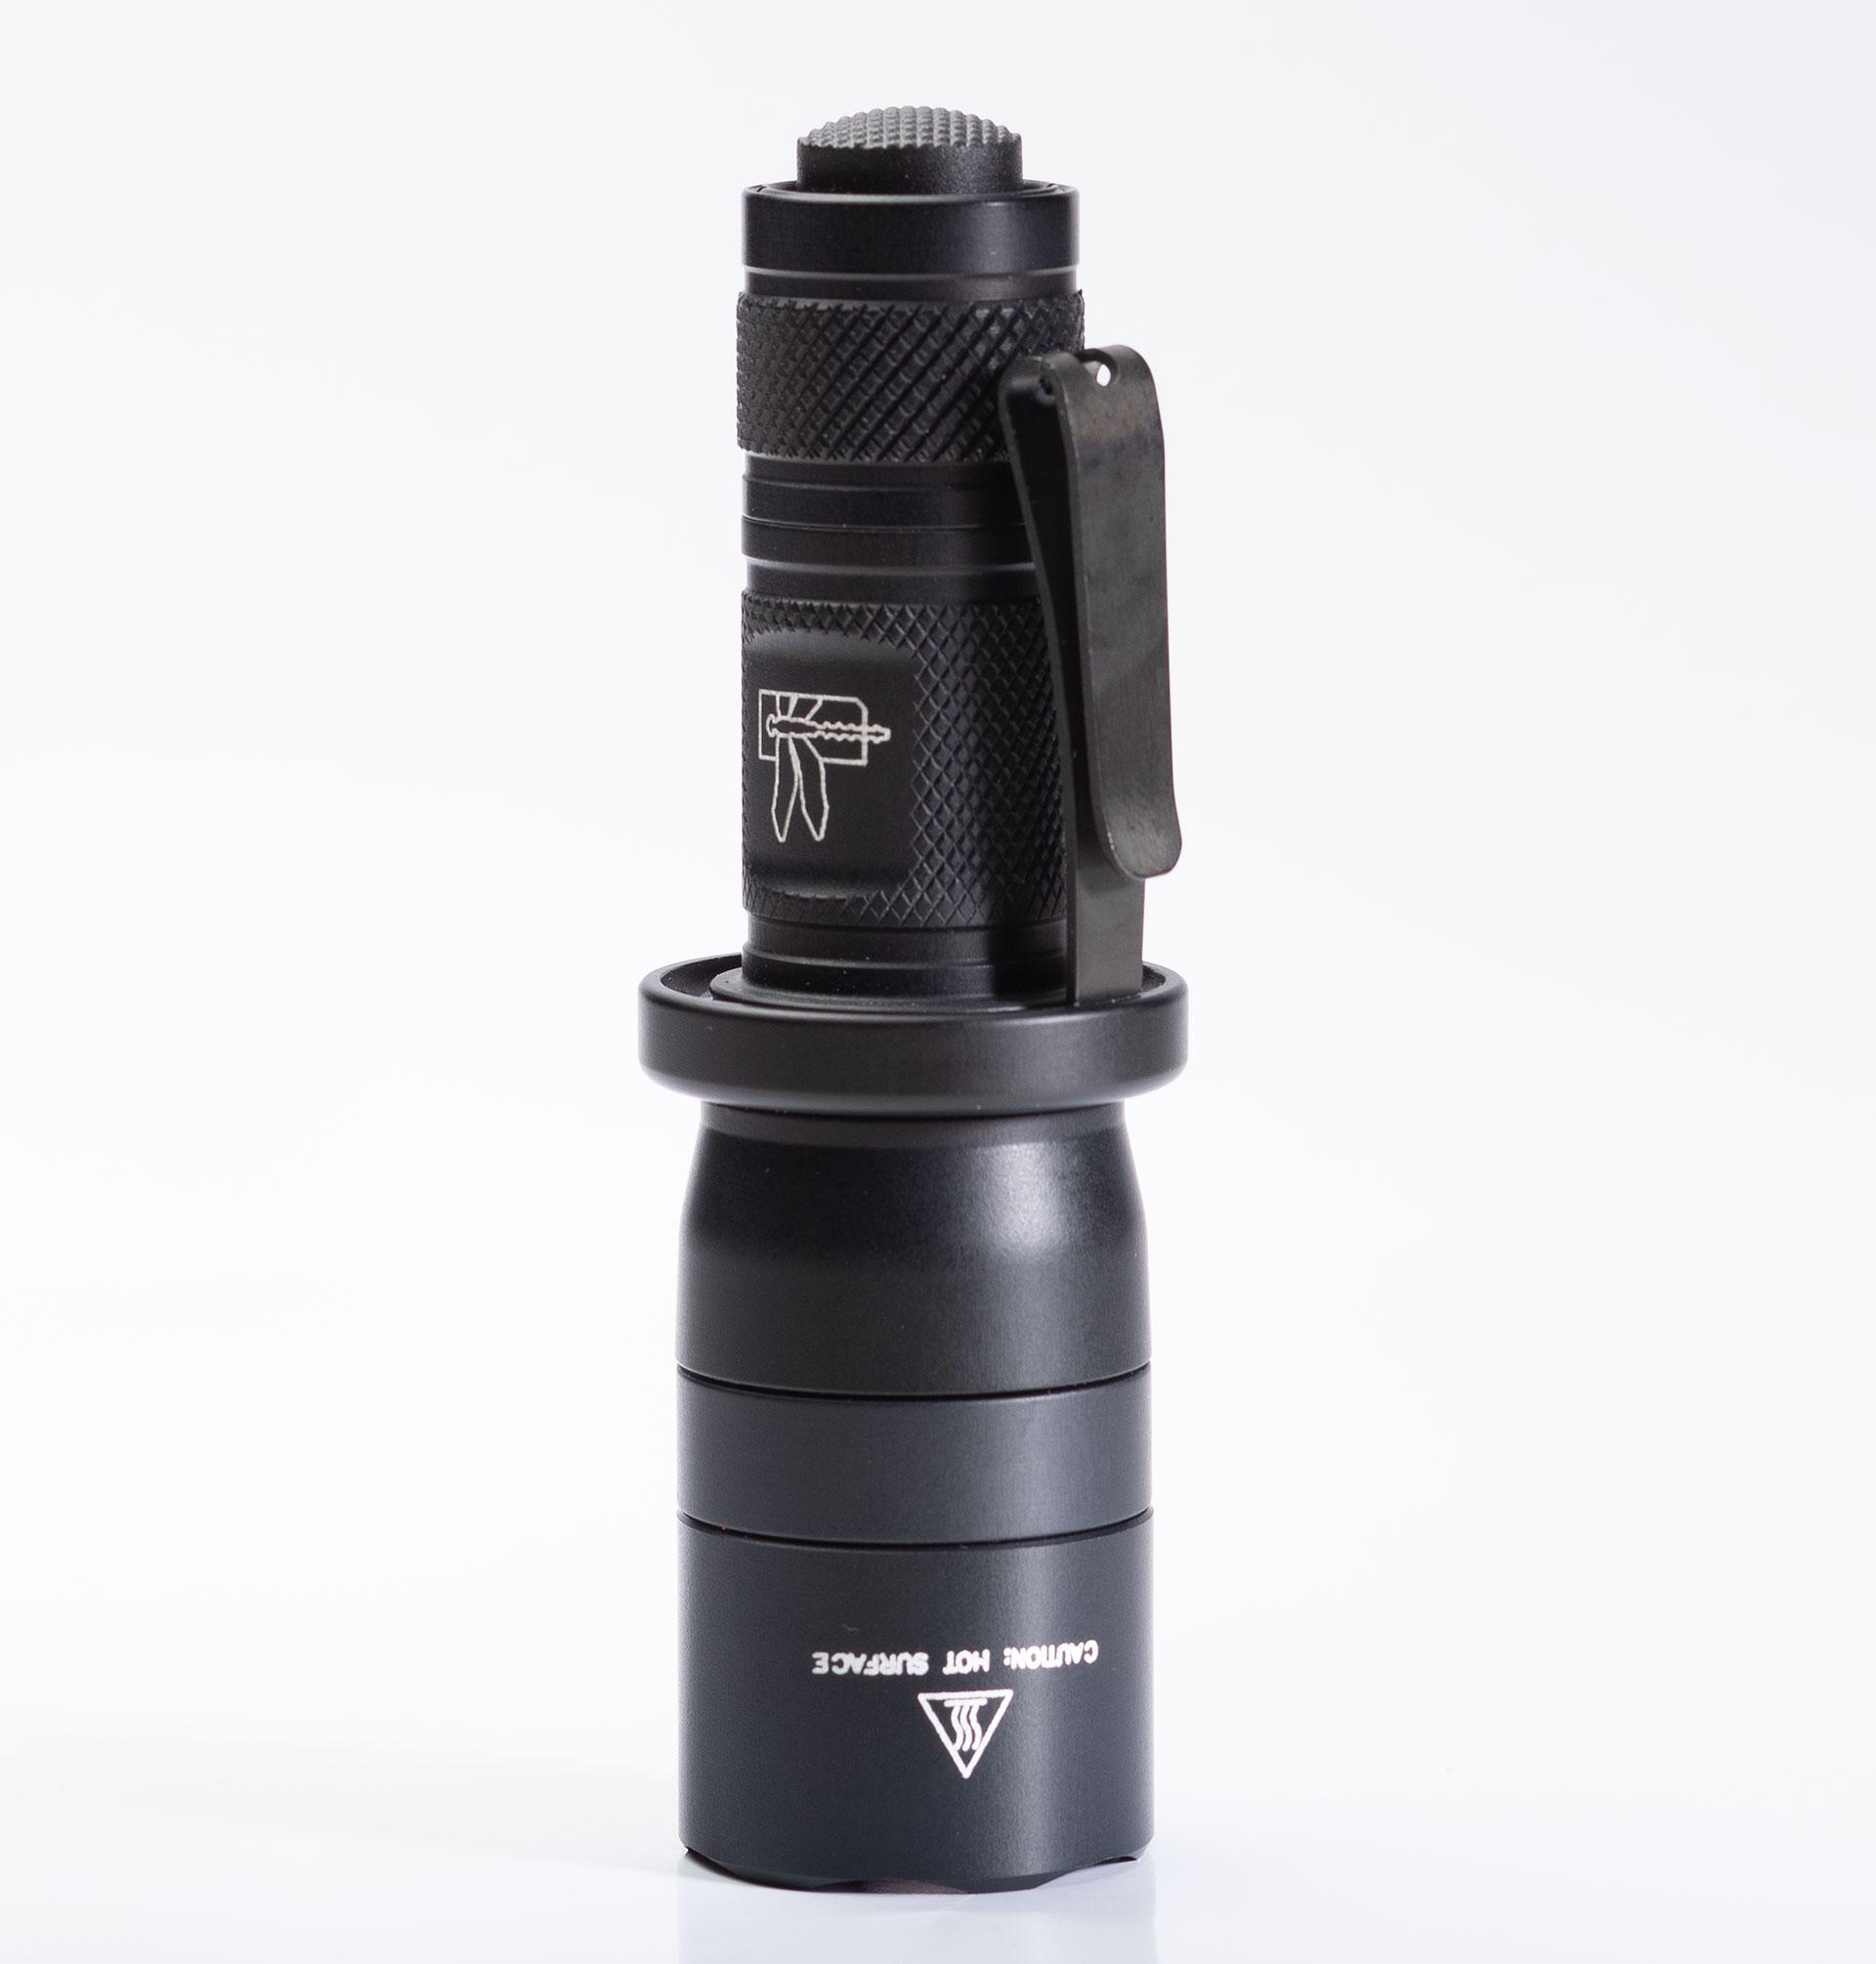 Haley Strategic SureFire D3FT Light is a combat flashlight